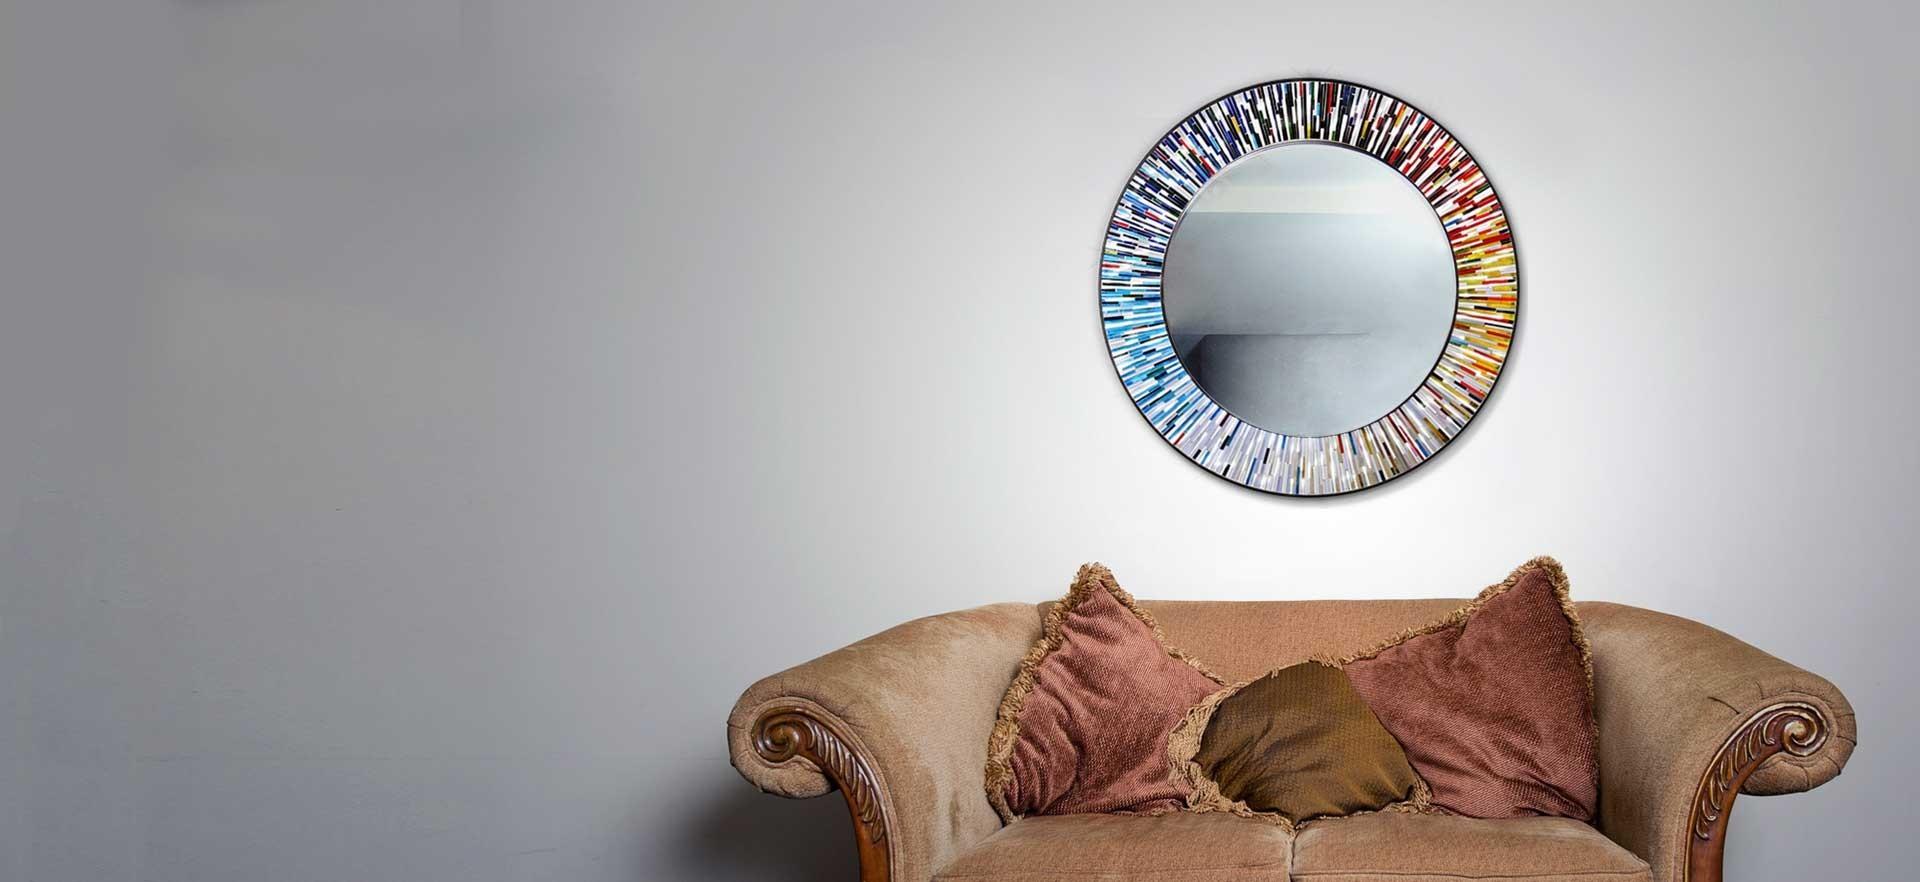 Luxury interior accessories: mirrors